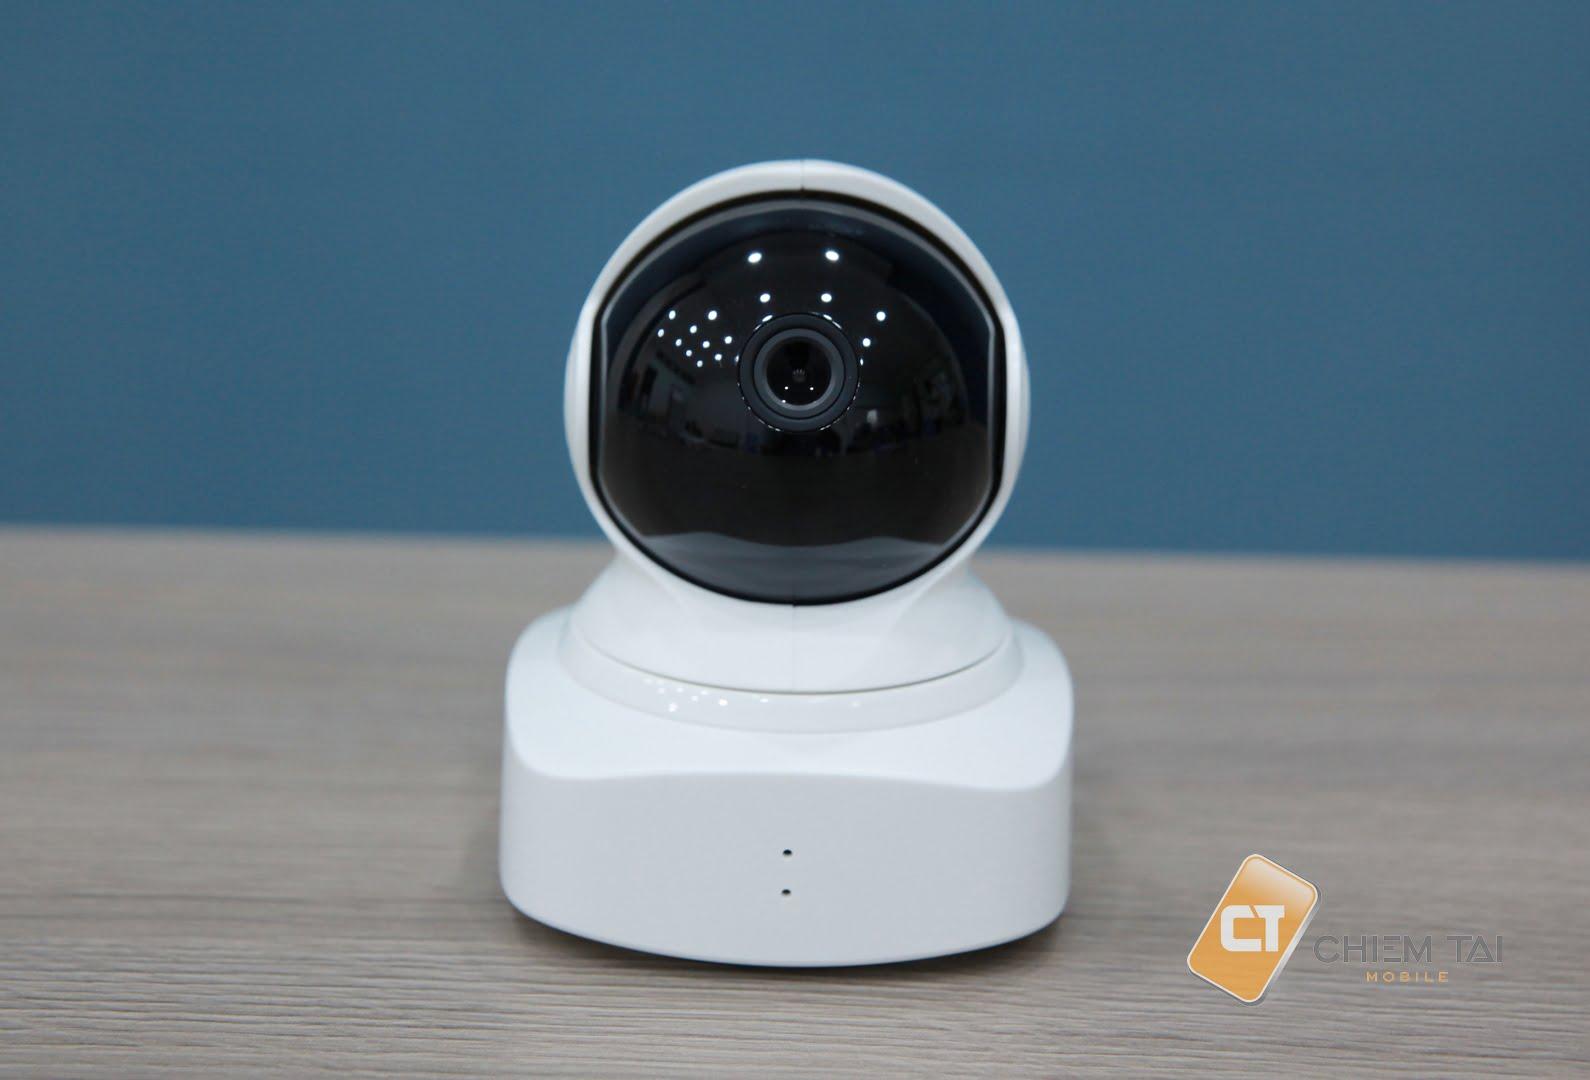 camera ip giam sat yi cloud dome 1080p 6007d32b96f2e